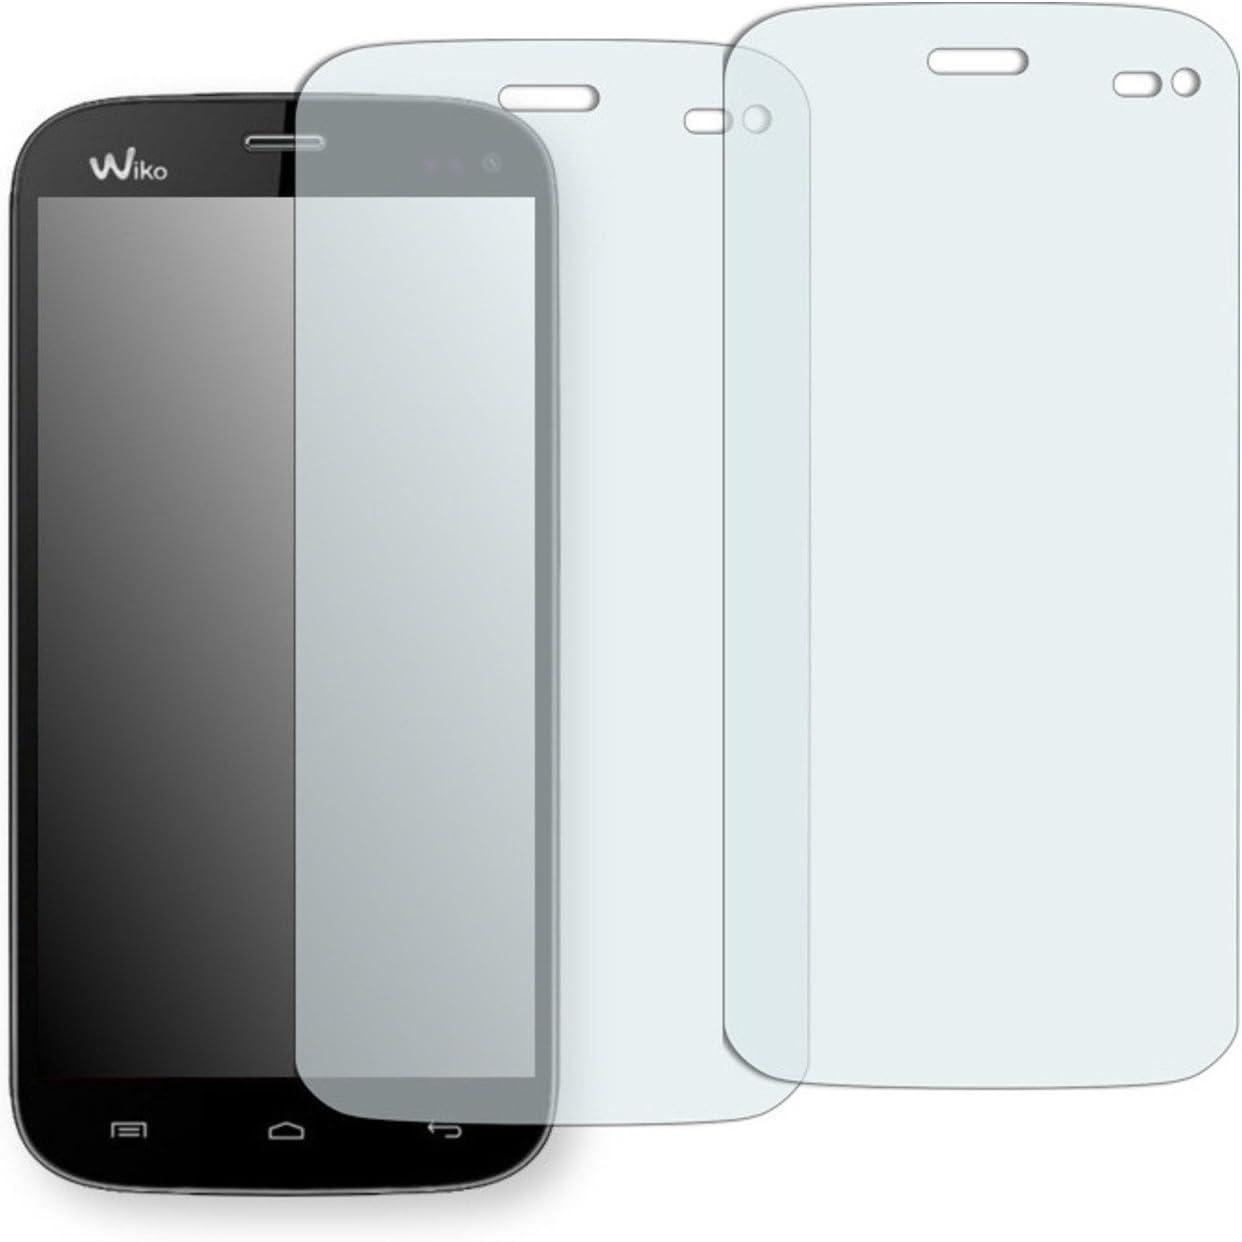 2x Golebo Semi-Matt protectores de pantalla para Wiko Darkmoon - (efecto antirreflectante, montaje muy fácil, removible sin residuos)